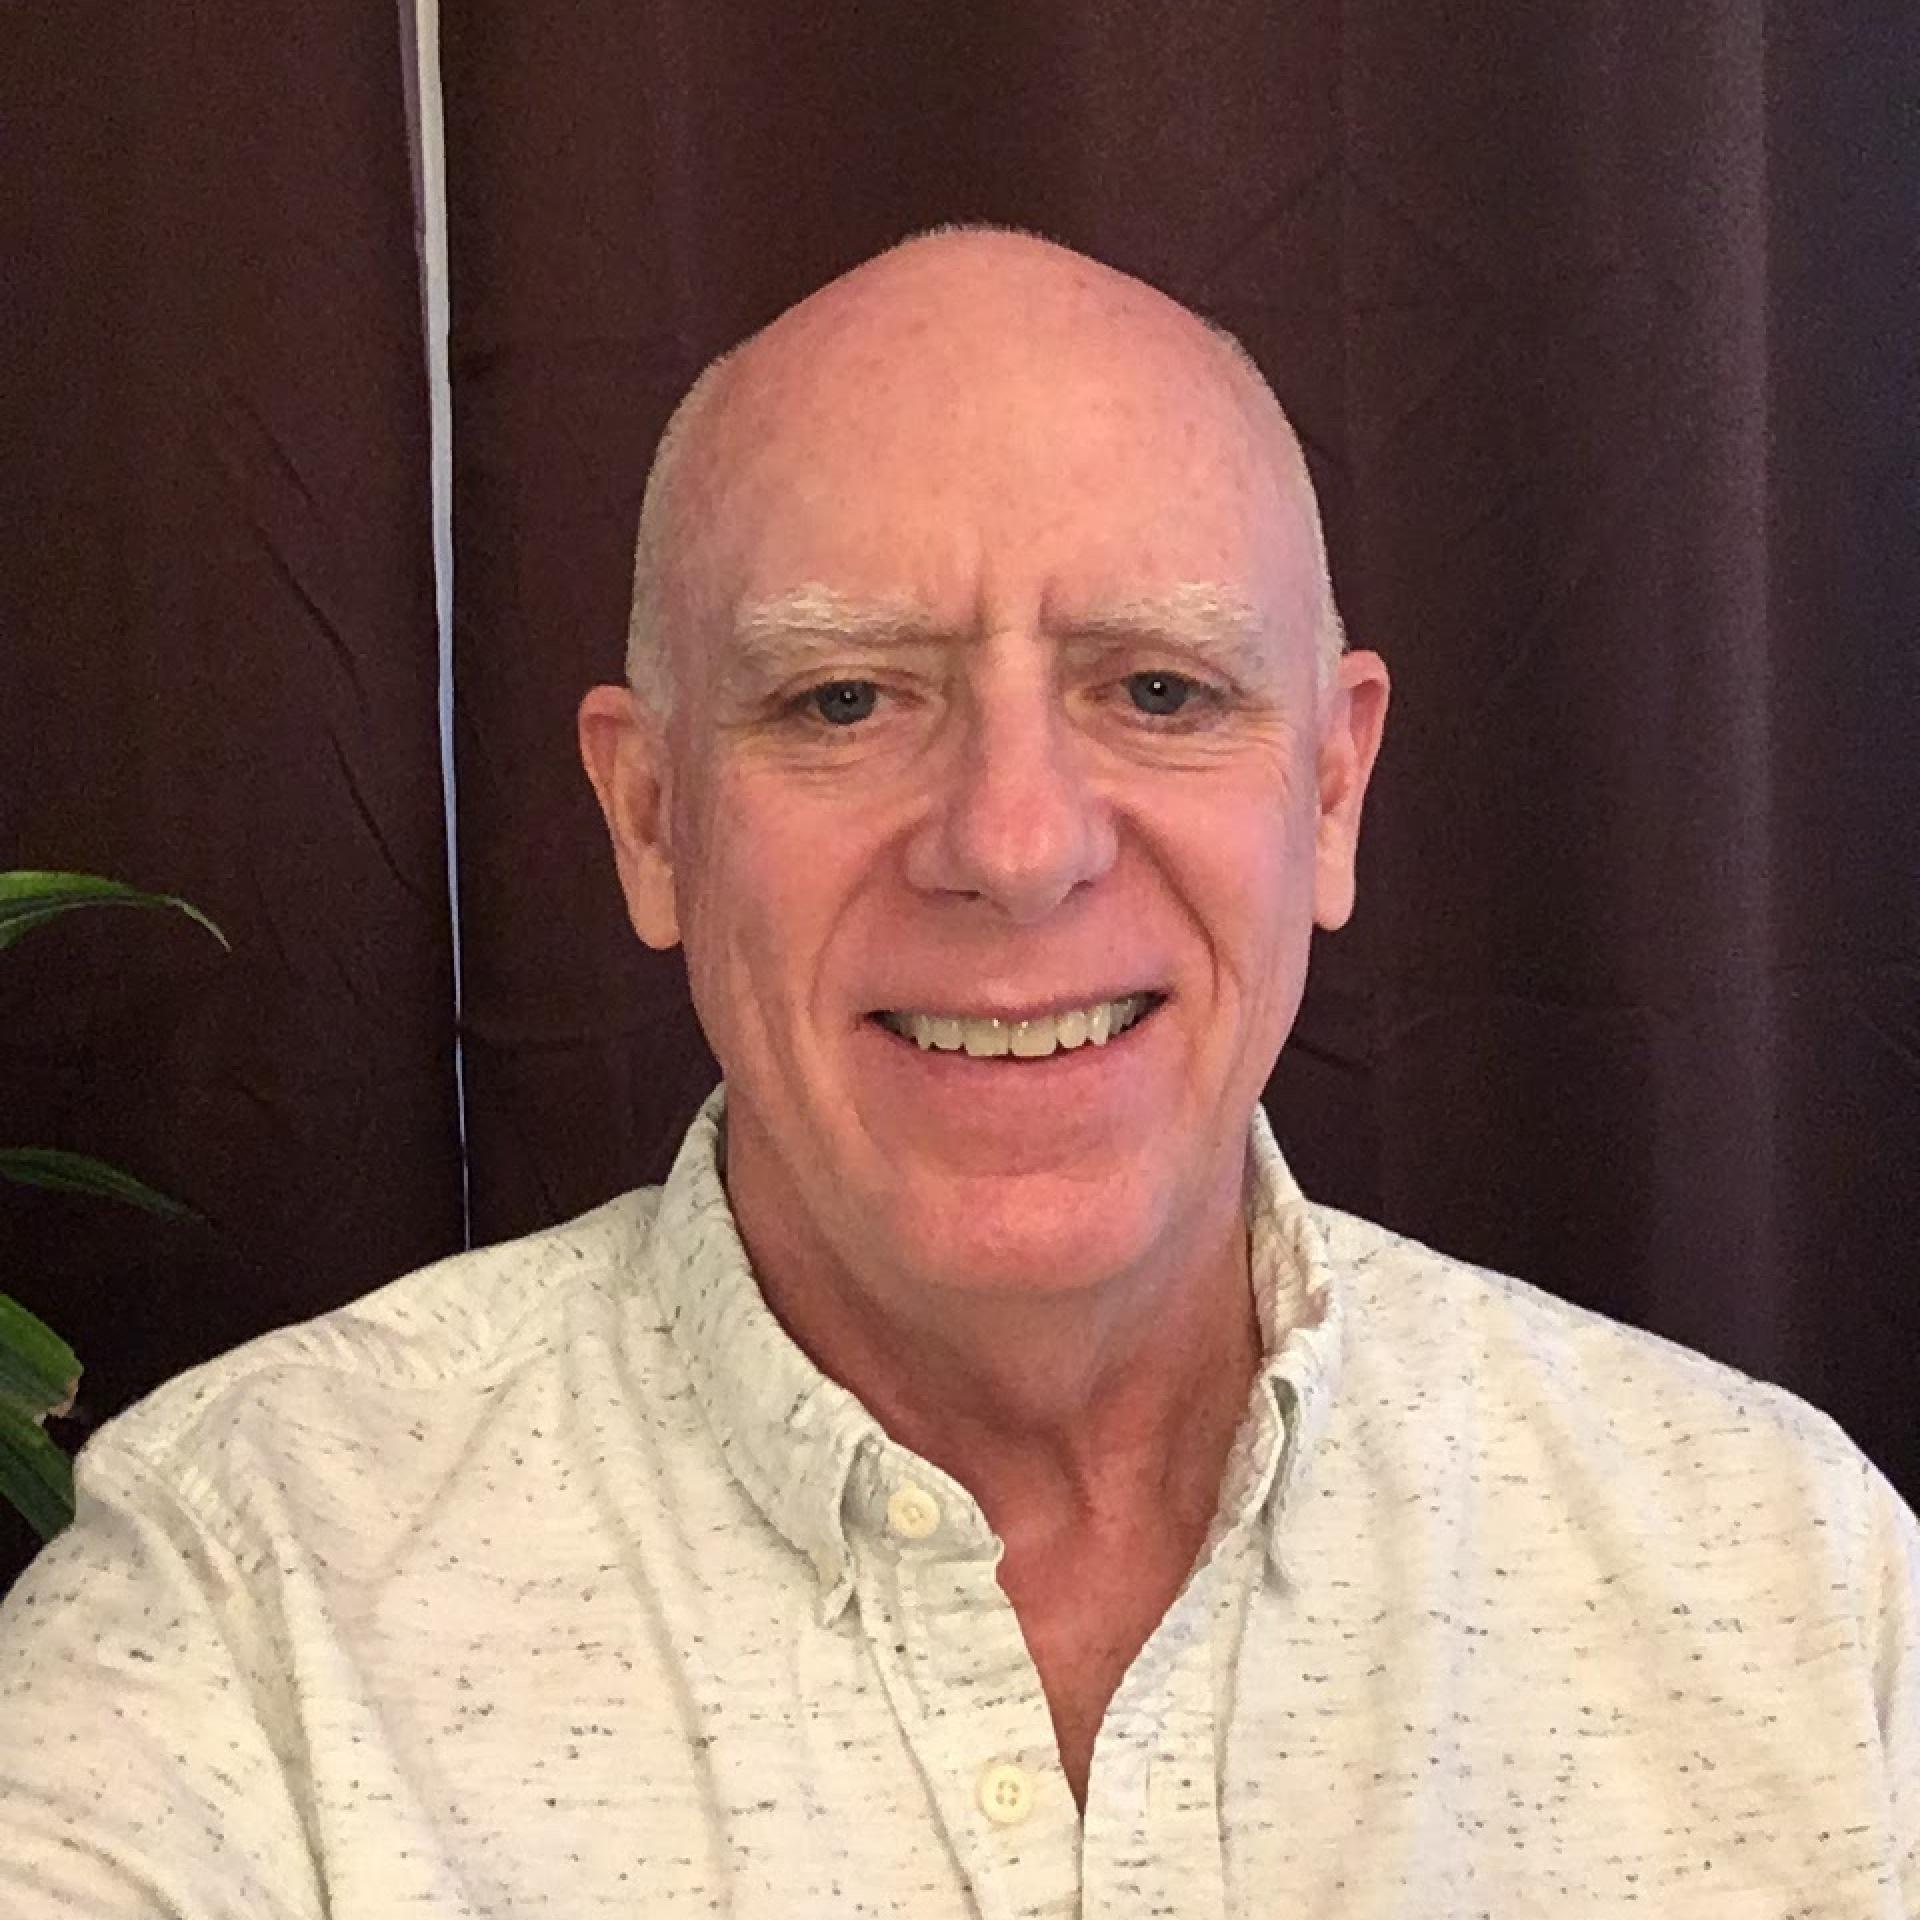 Michael Finney profile photo